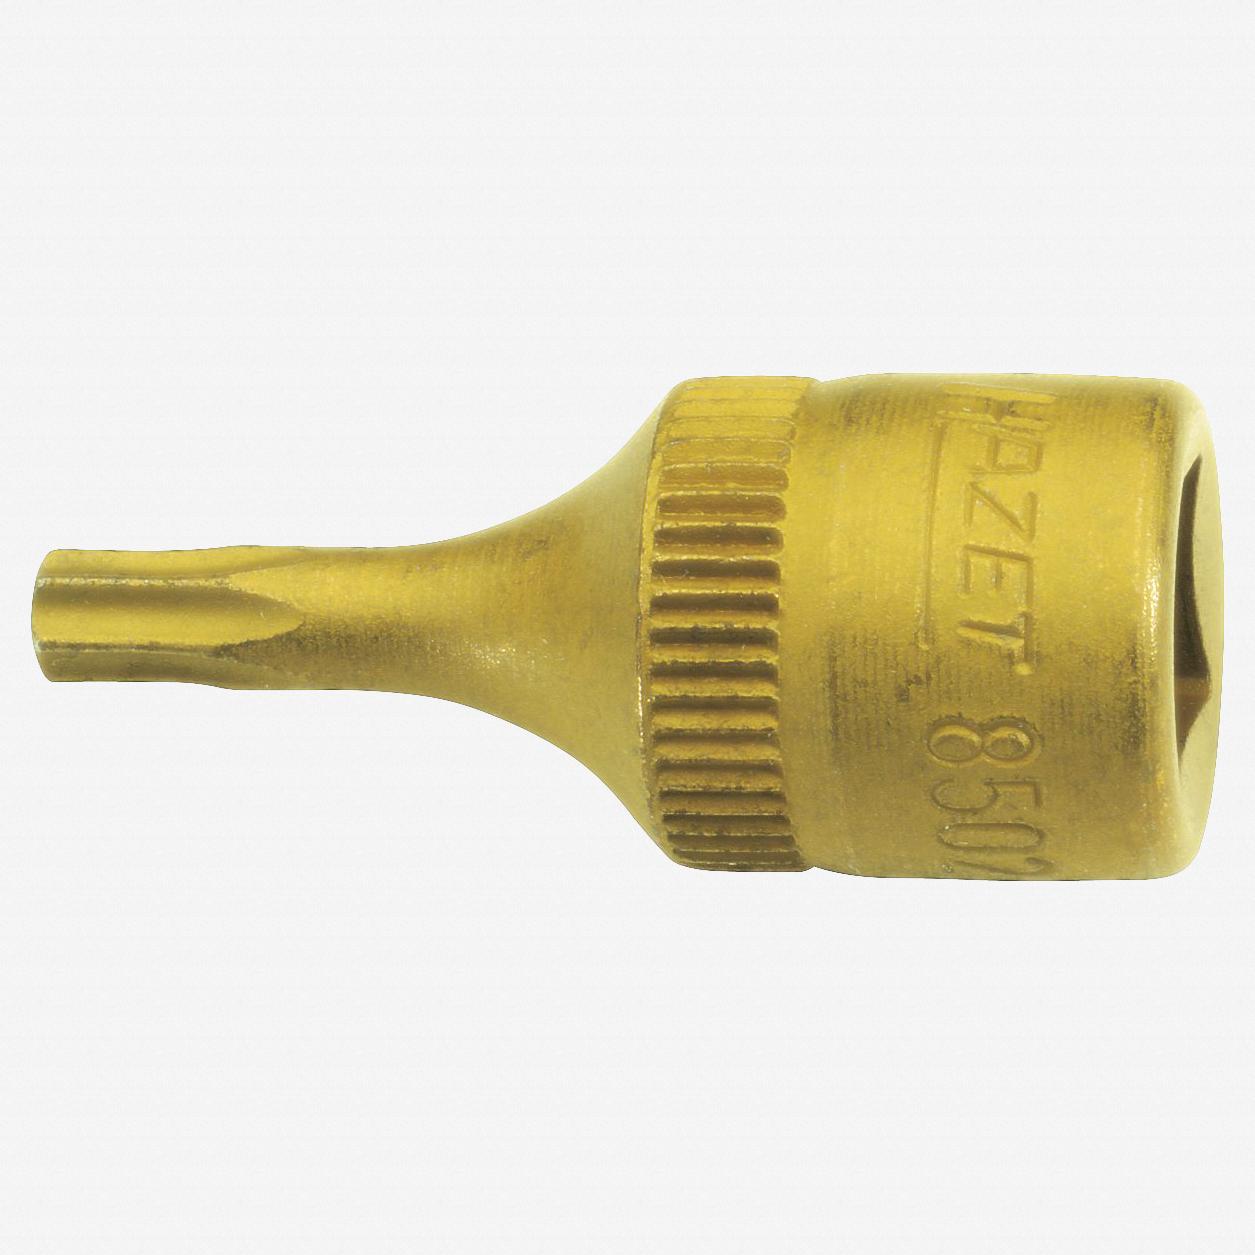 "Hazet 8502-T25 T25 Torx TiN 1/4"" Socket - KC Tool"